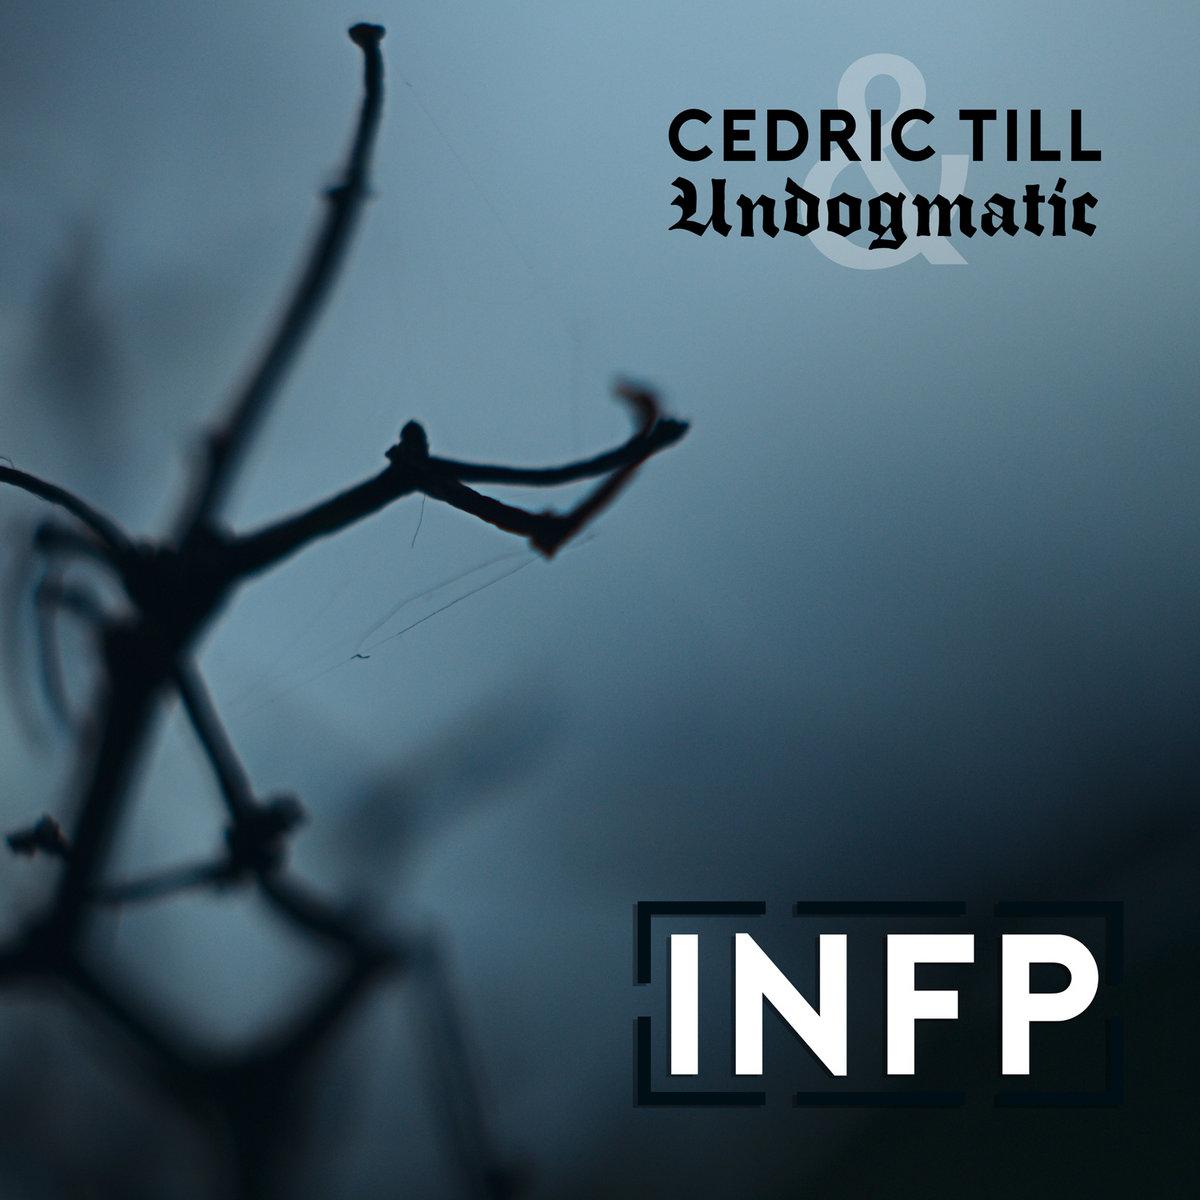 INFP | Undogmatic